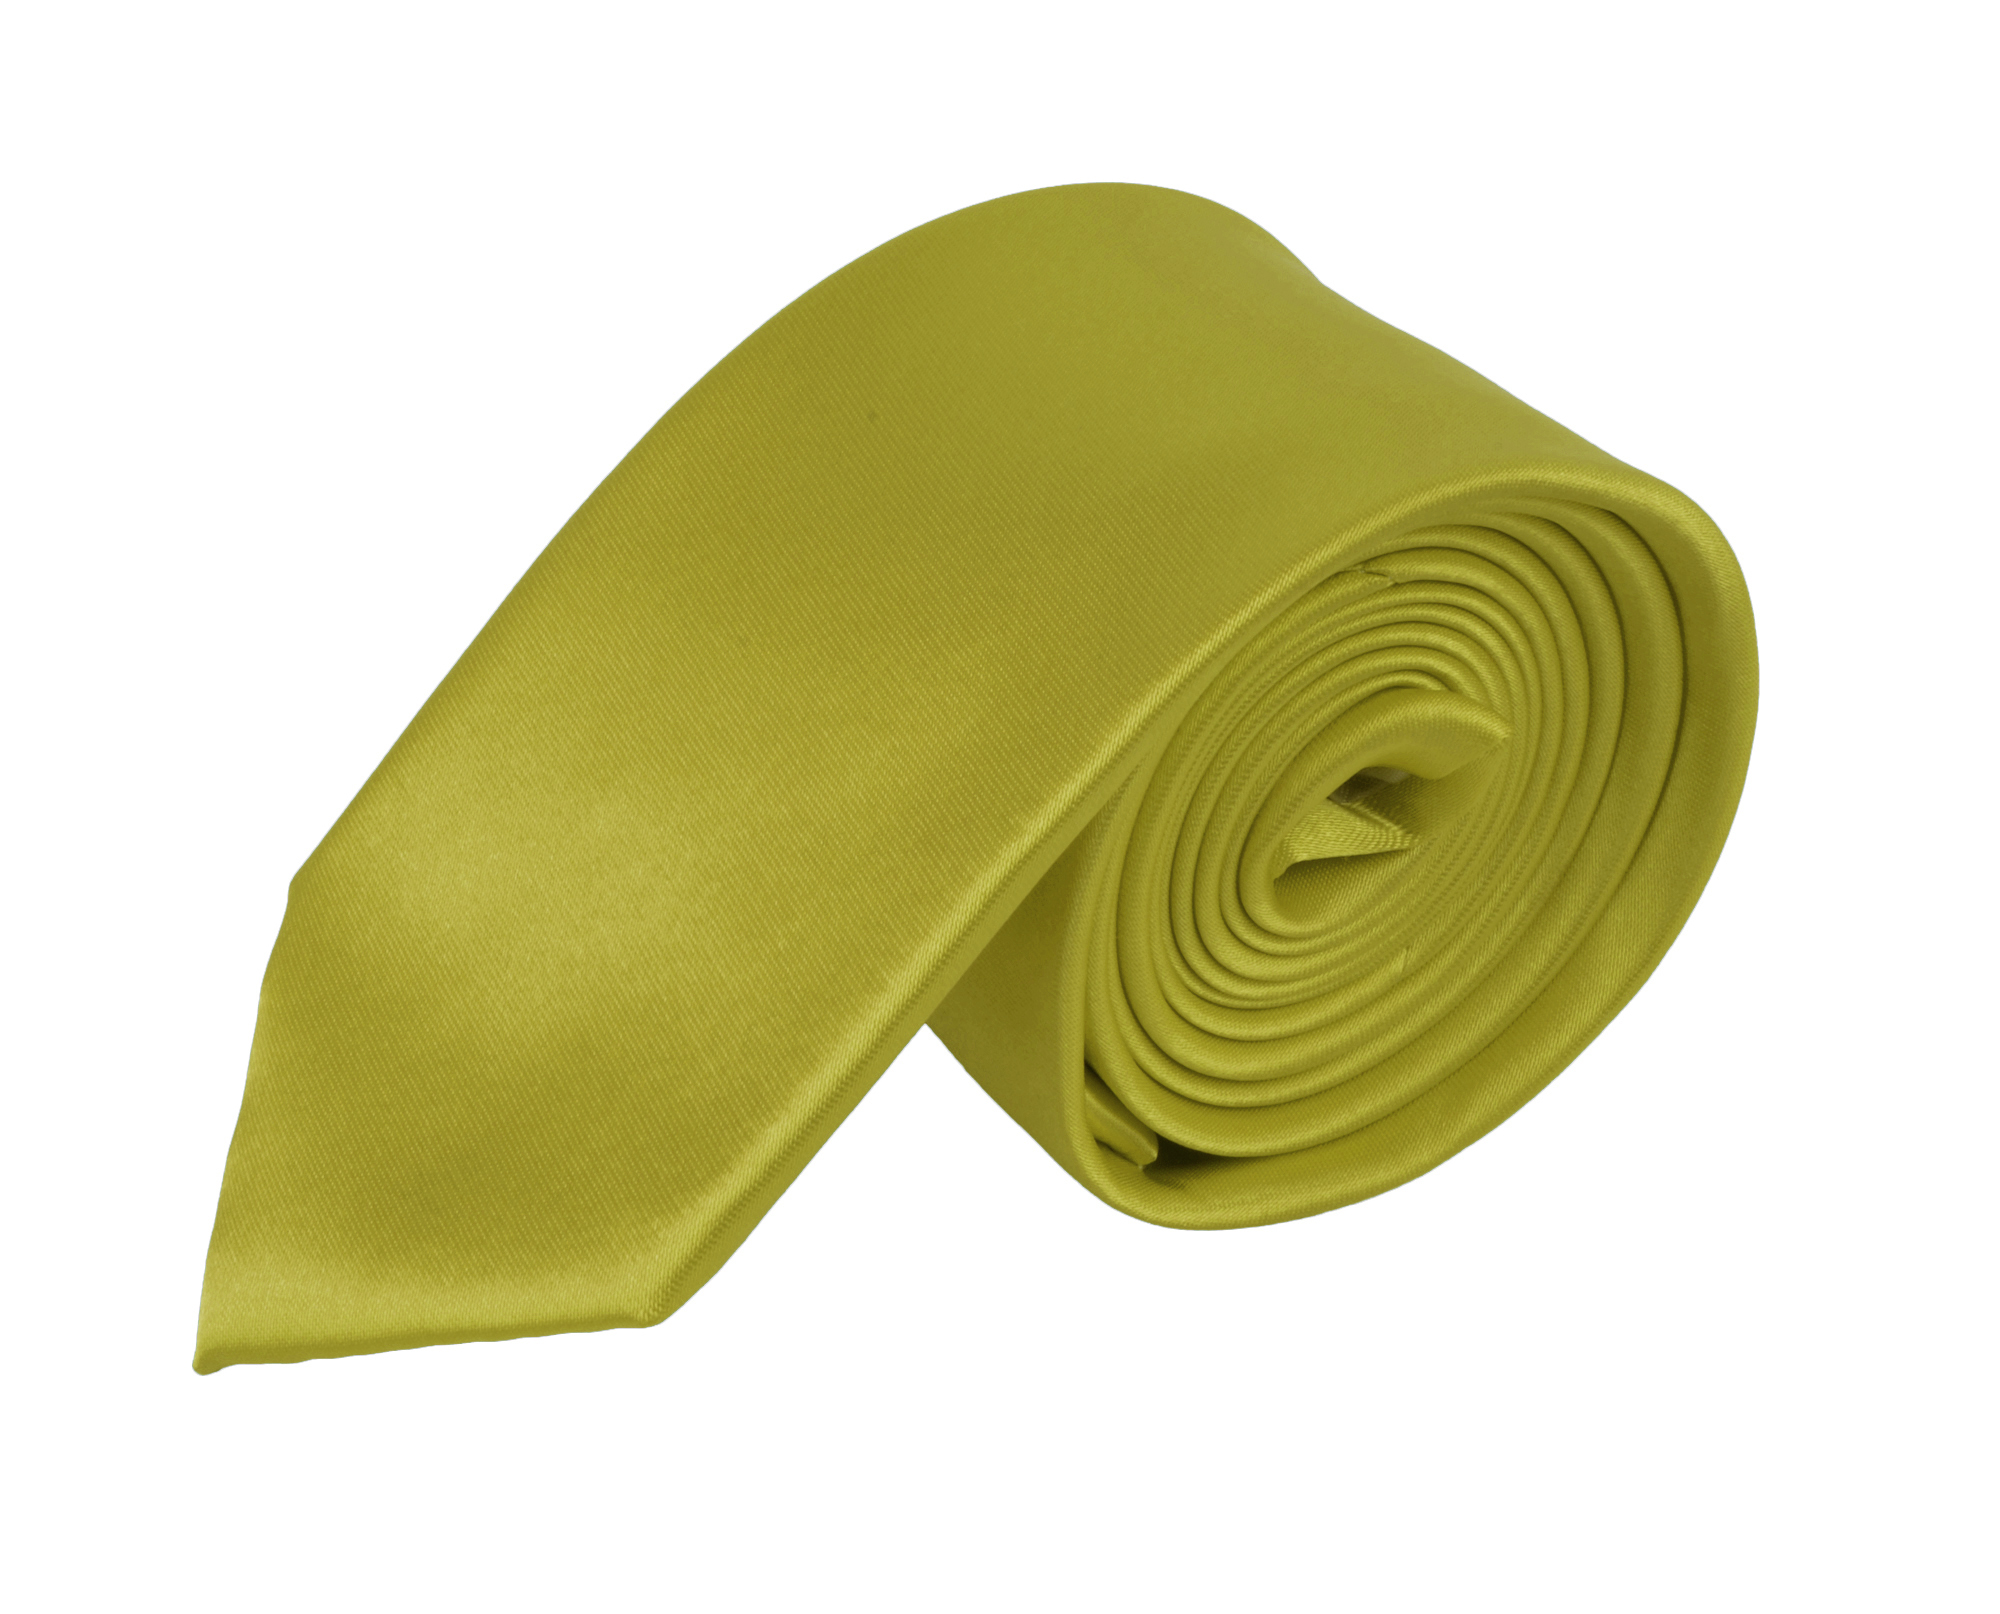 Moda Di Raza - Men's / Boy's Slim Polyester Tie  - Neckwear - Skinny Tie by Moda Di Raza - Mustard One Size